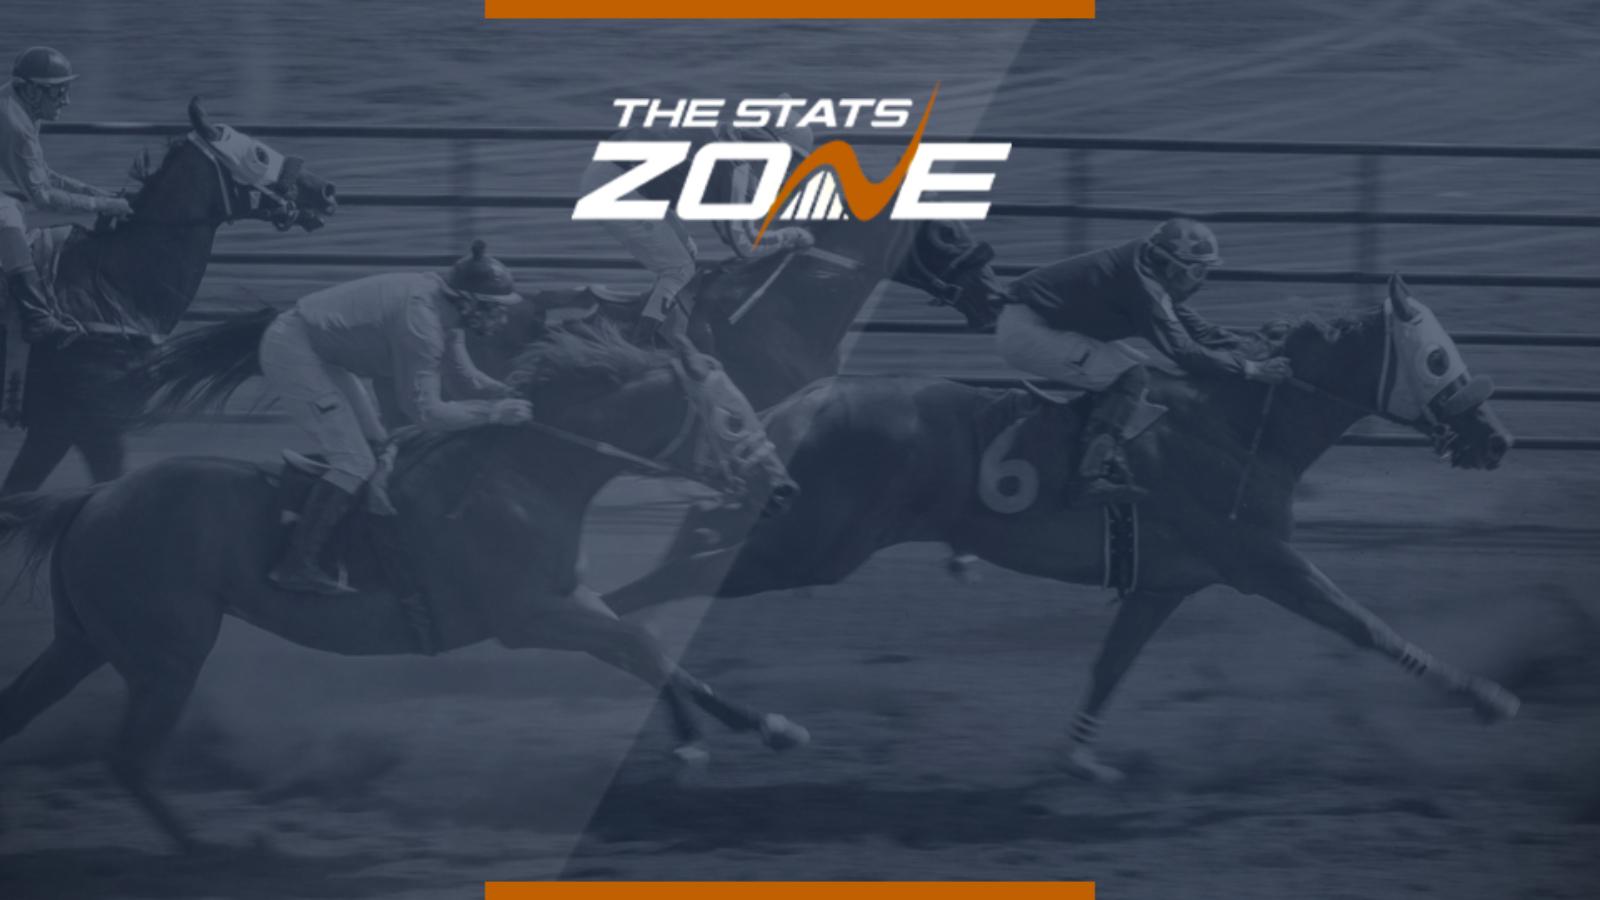 kentucky derby 2020 horses